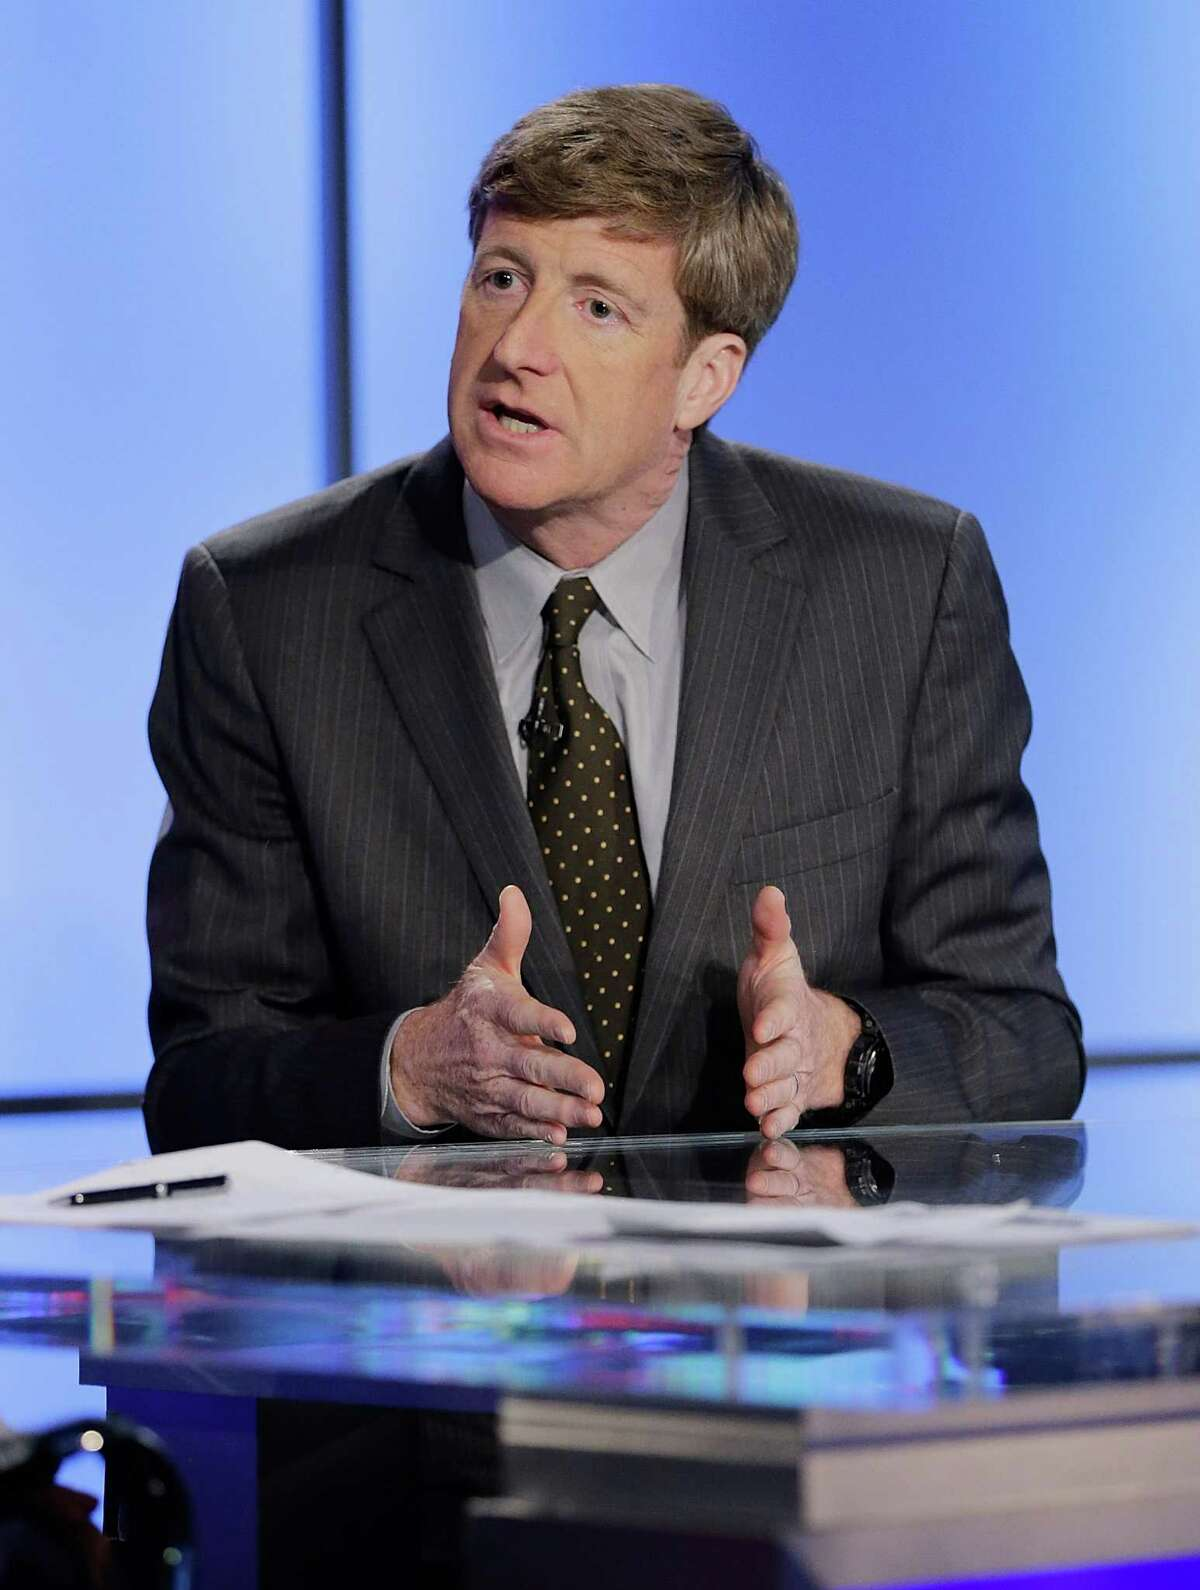 NEW YORK, NY - OCTOBER 06: Former Congressman of Rhode Island Patrick J. Kennedy visits FOX News'